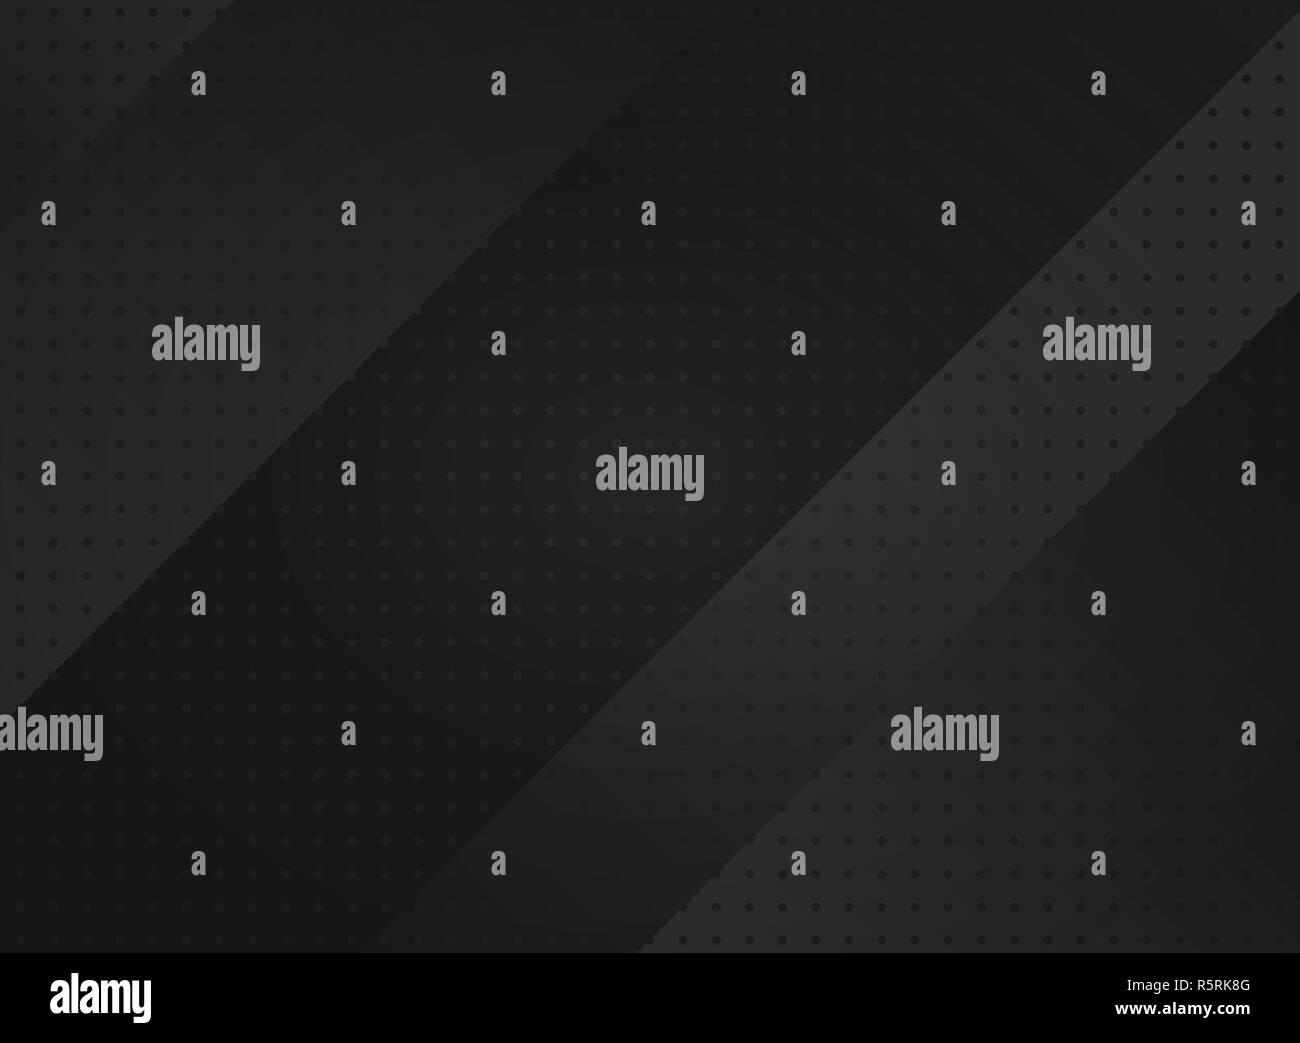 Lighten black abstraction technology futuristic geometric background. Vector eps10 - Stock Image